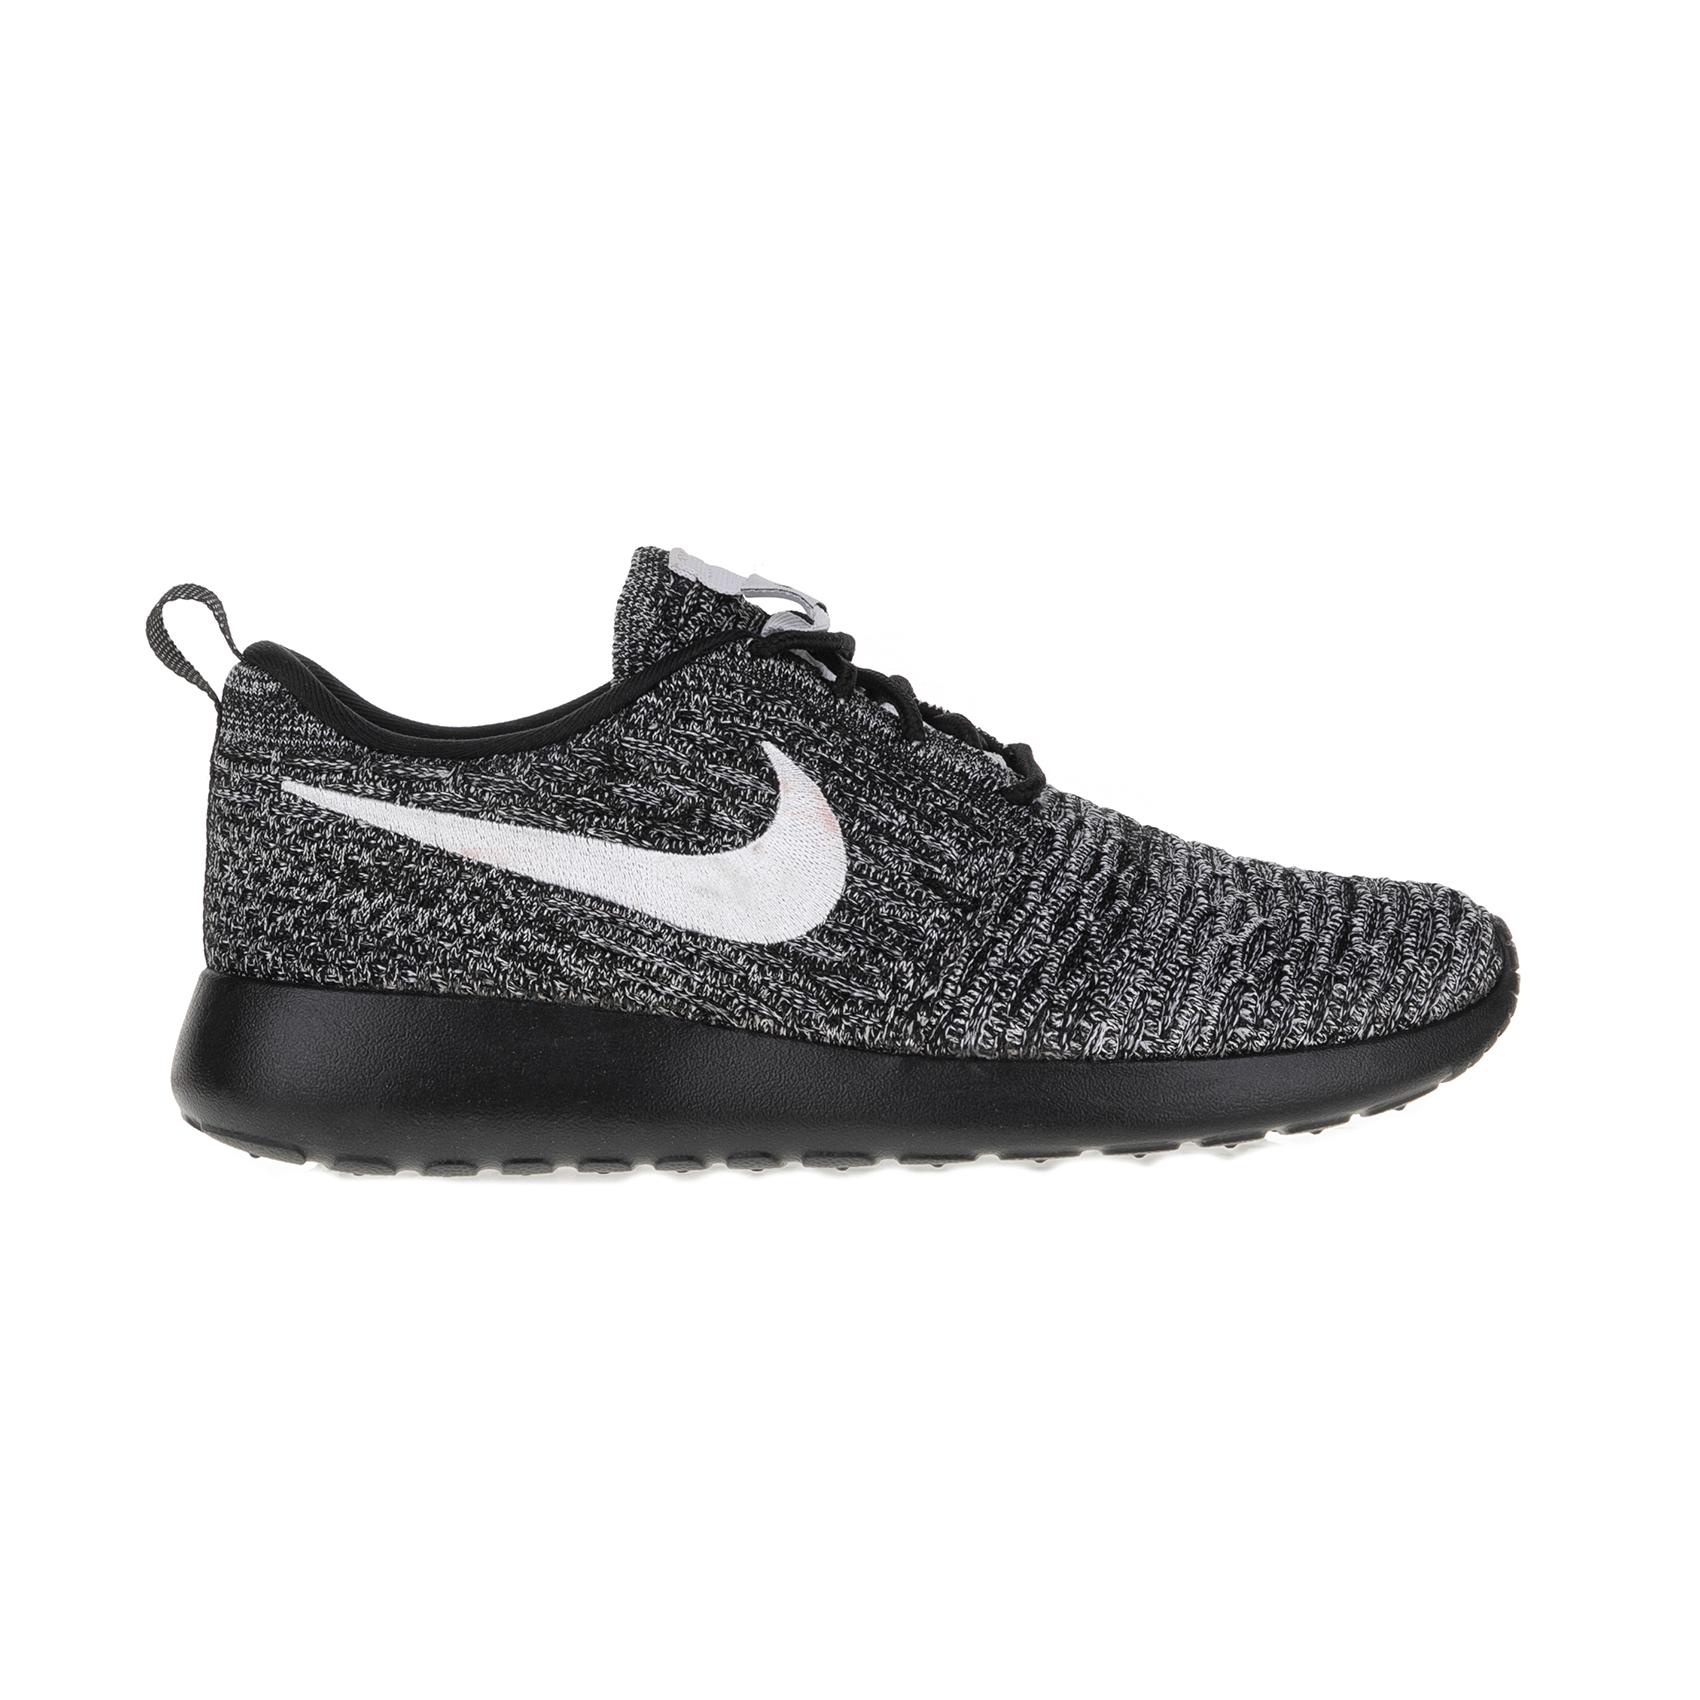 NIKE – Γυναικεία αθλητικά παπούτσια Nike ROSHE ONE FLYKNIT μαύρα